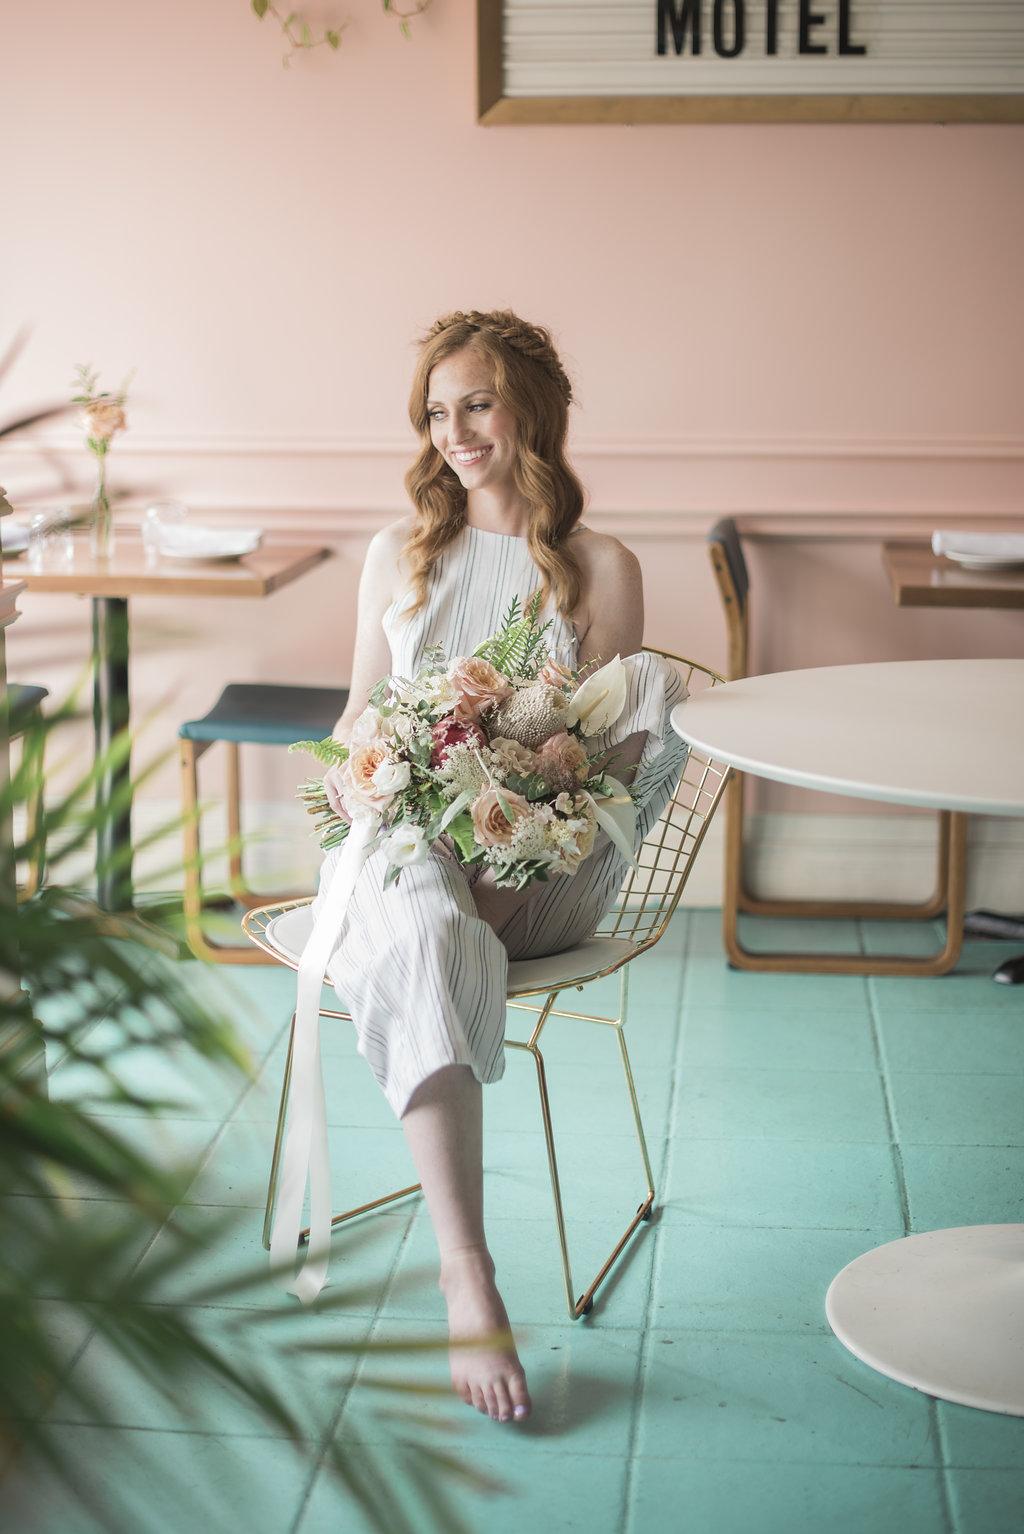 Motel-Restaurant-Editorial-Vineyard-Bride-photo-by-Blynda-DaCosta-Photography-029.JPG